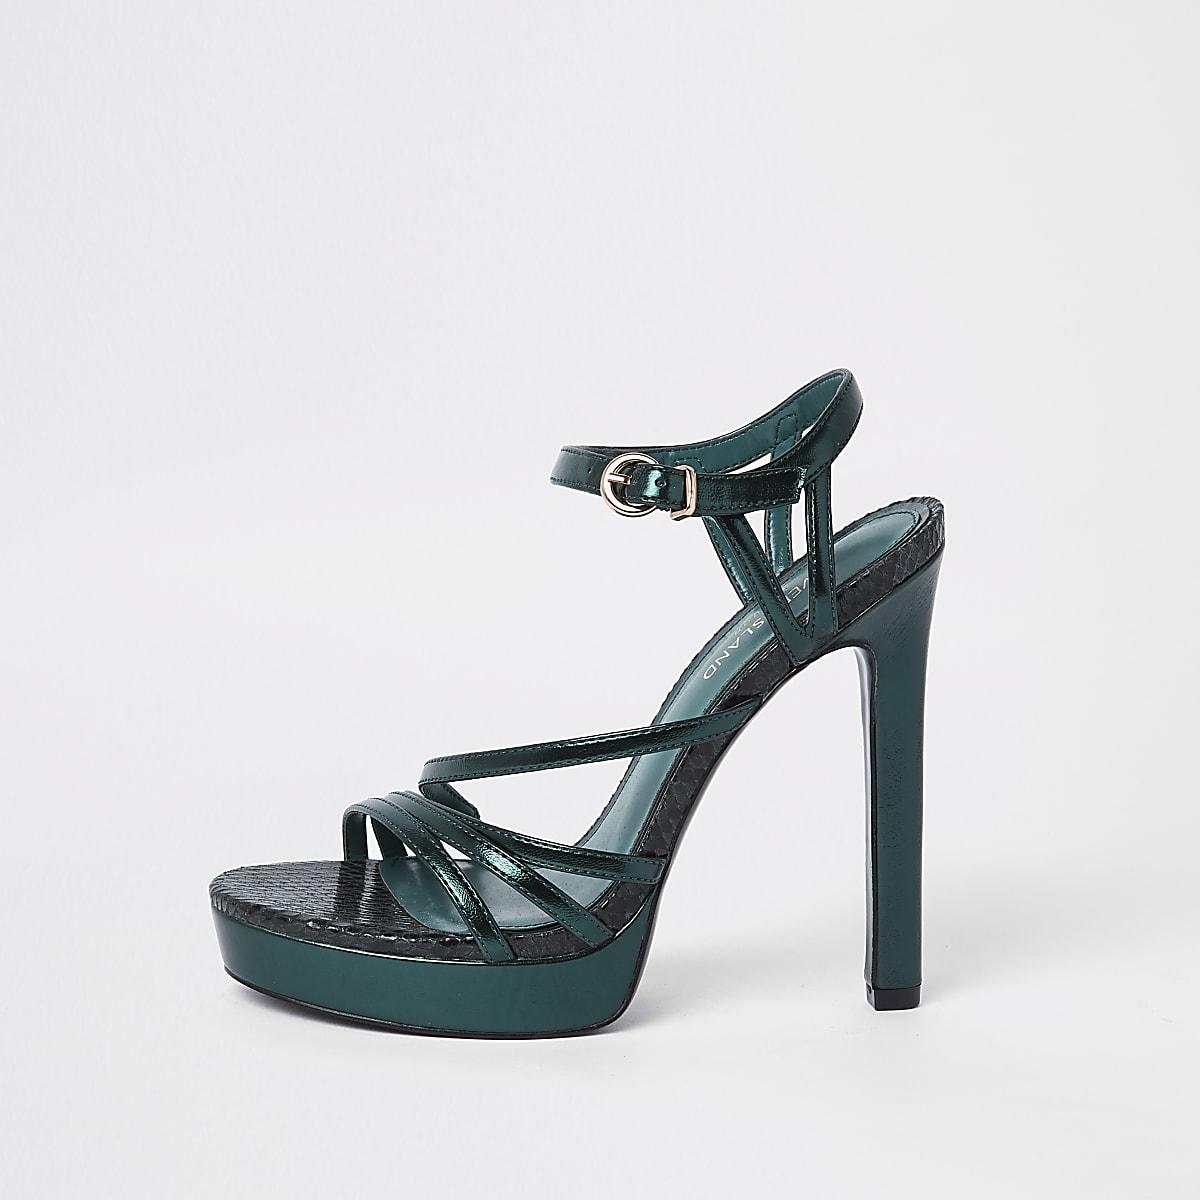 Donkergroene sandalen met plateauzool